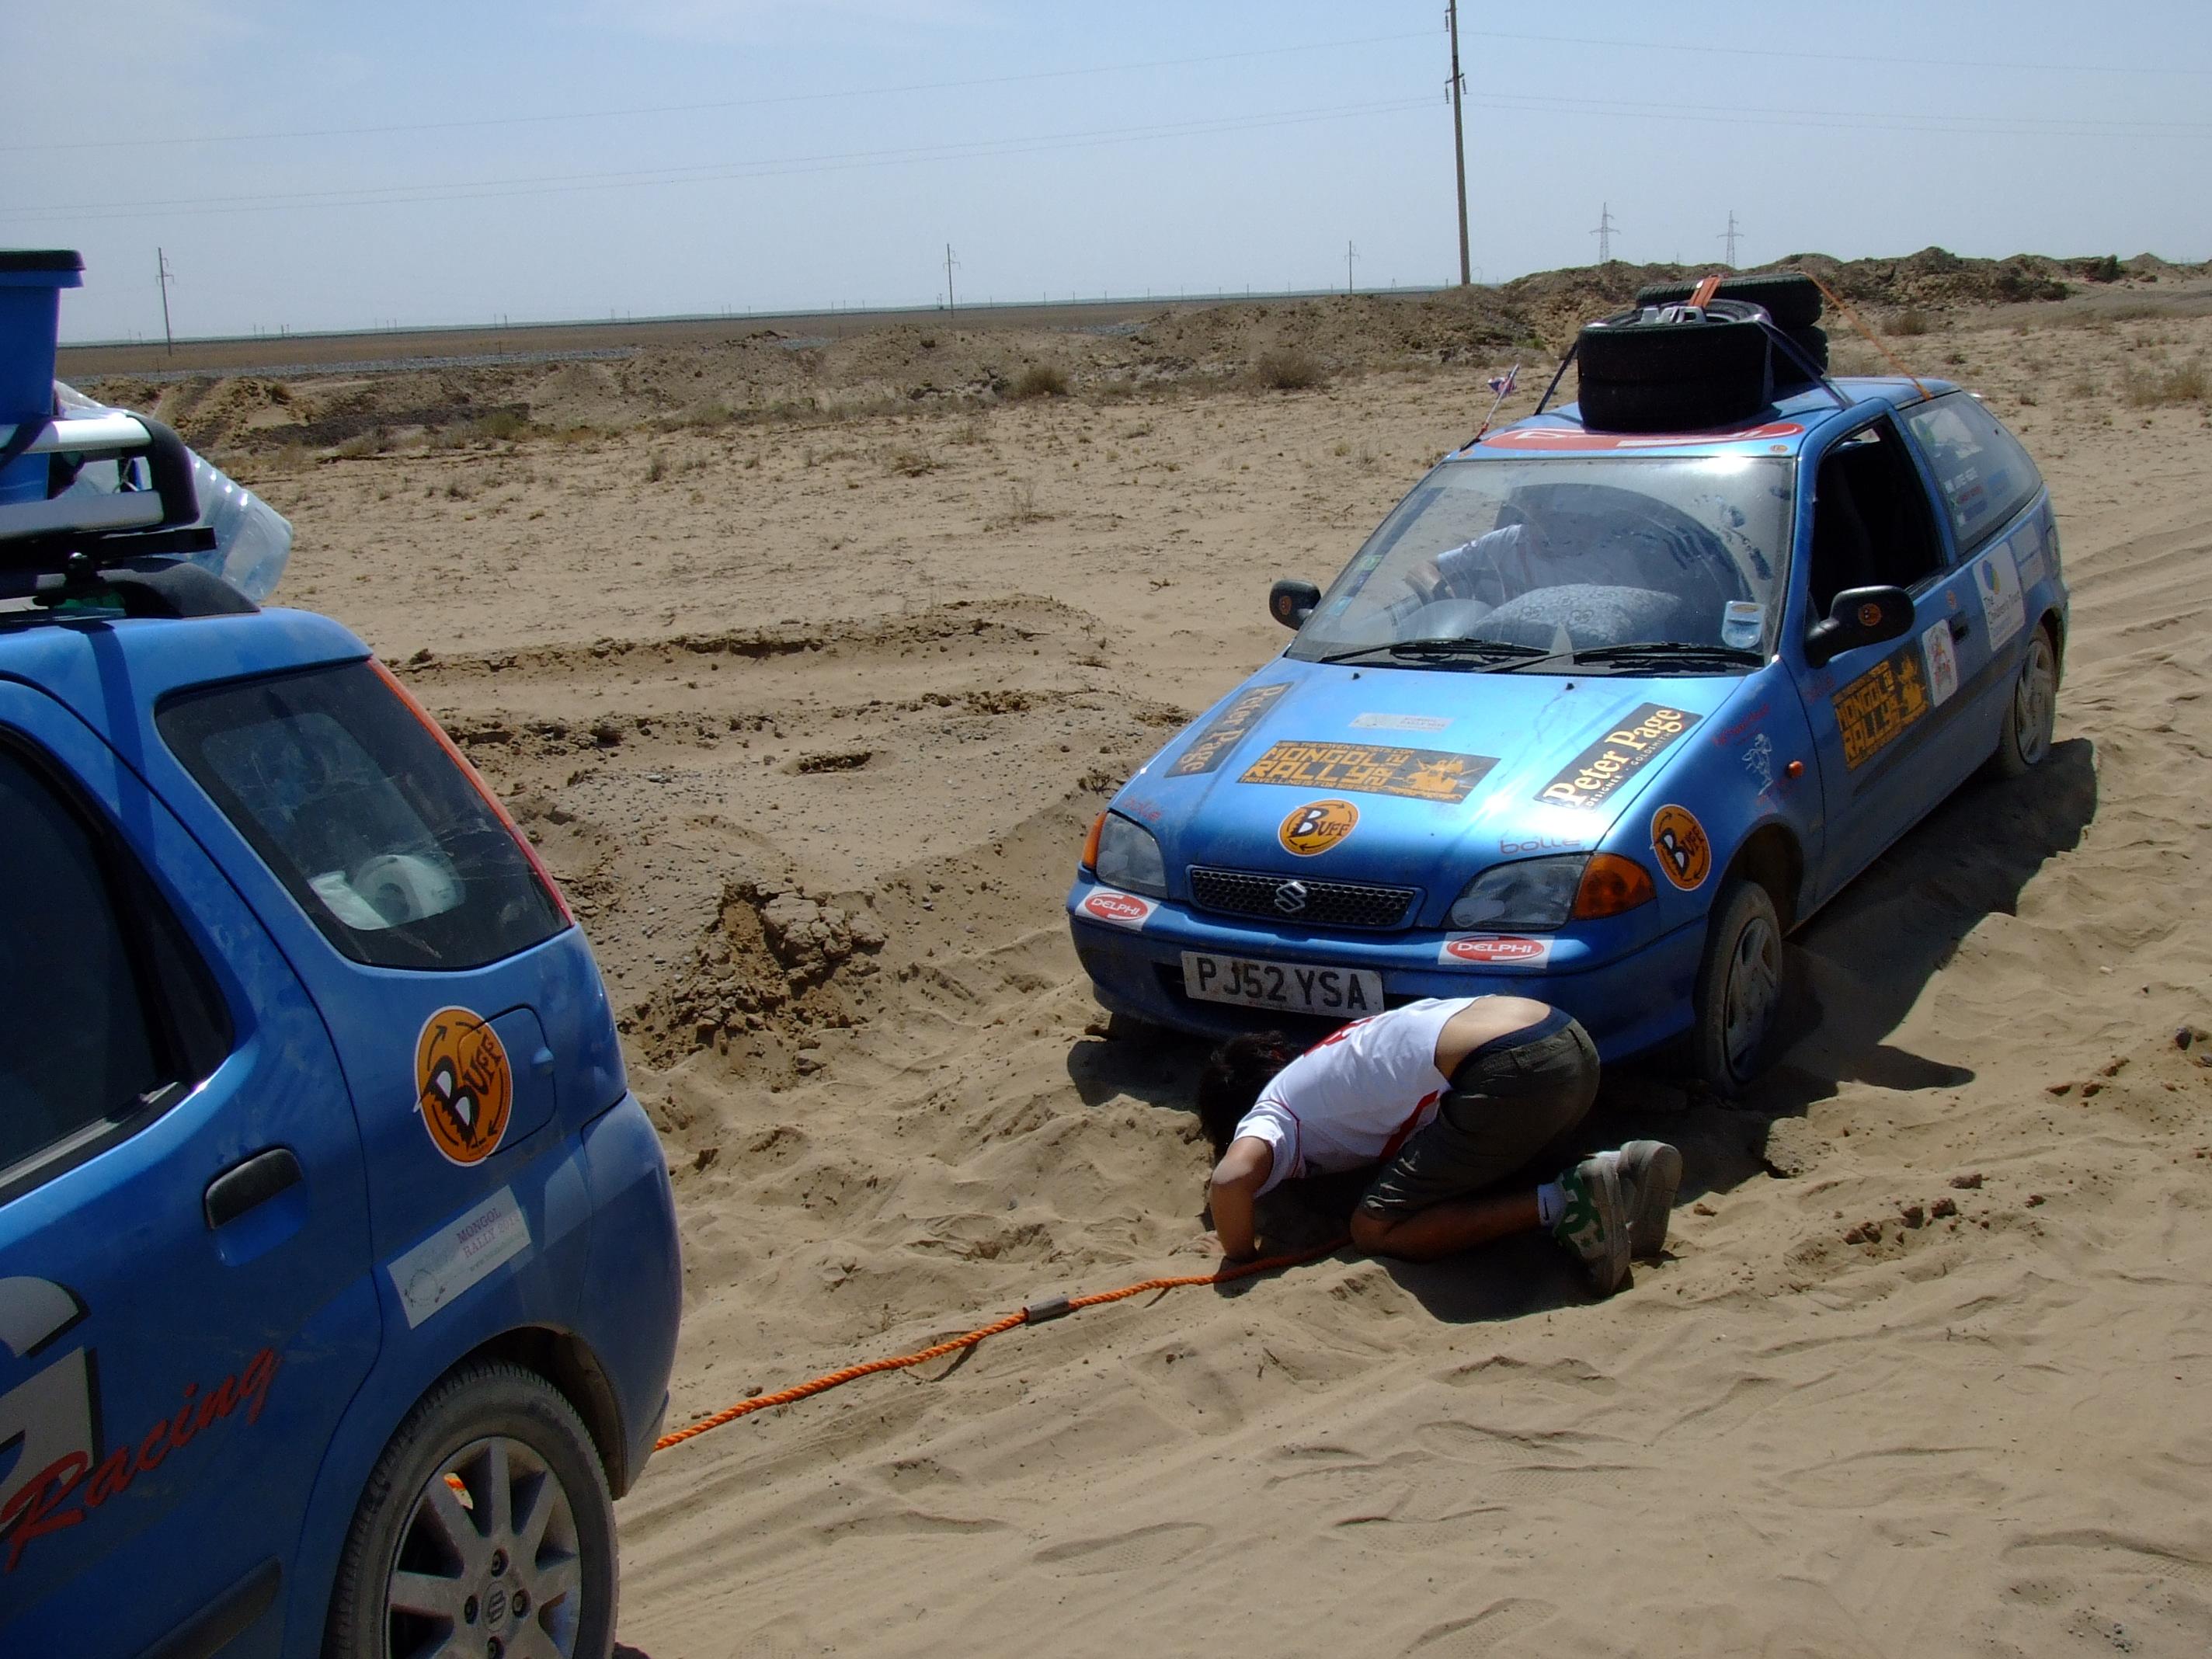 kazakh desert, kazakhstan, mongol rally 2013, mongol rally 2012